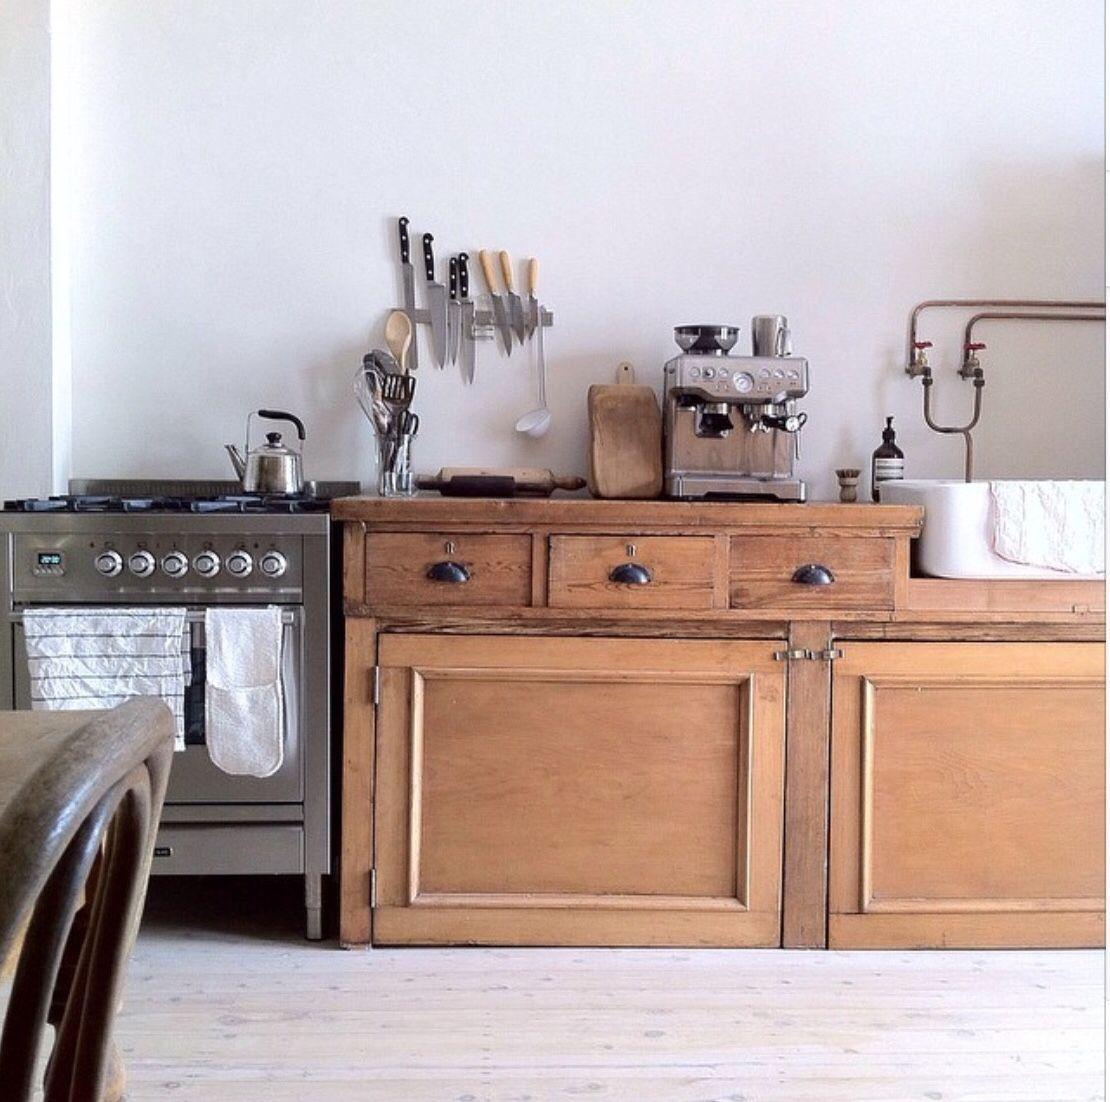 Interior old kitchen raw rustic wooden kitchen simple